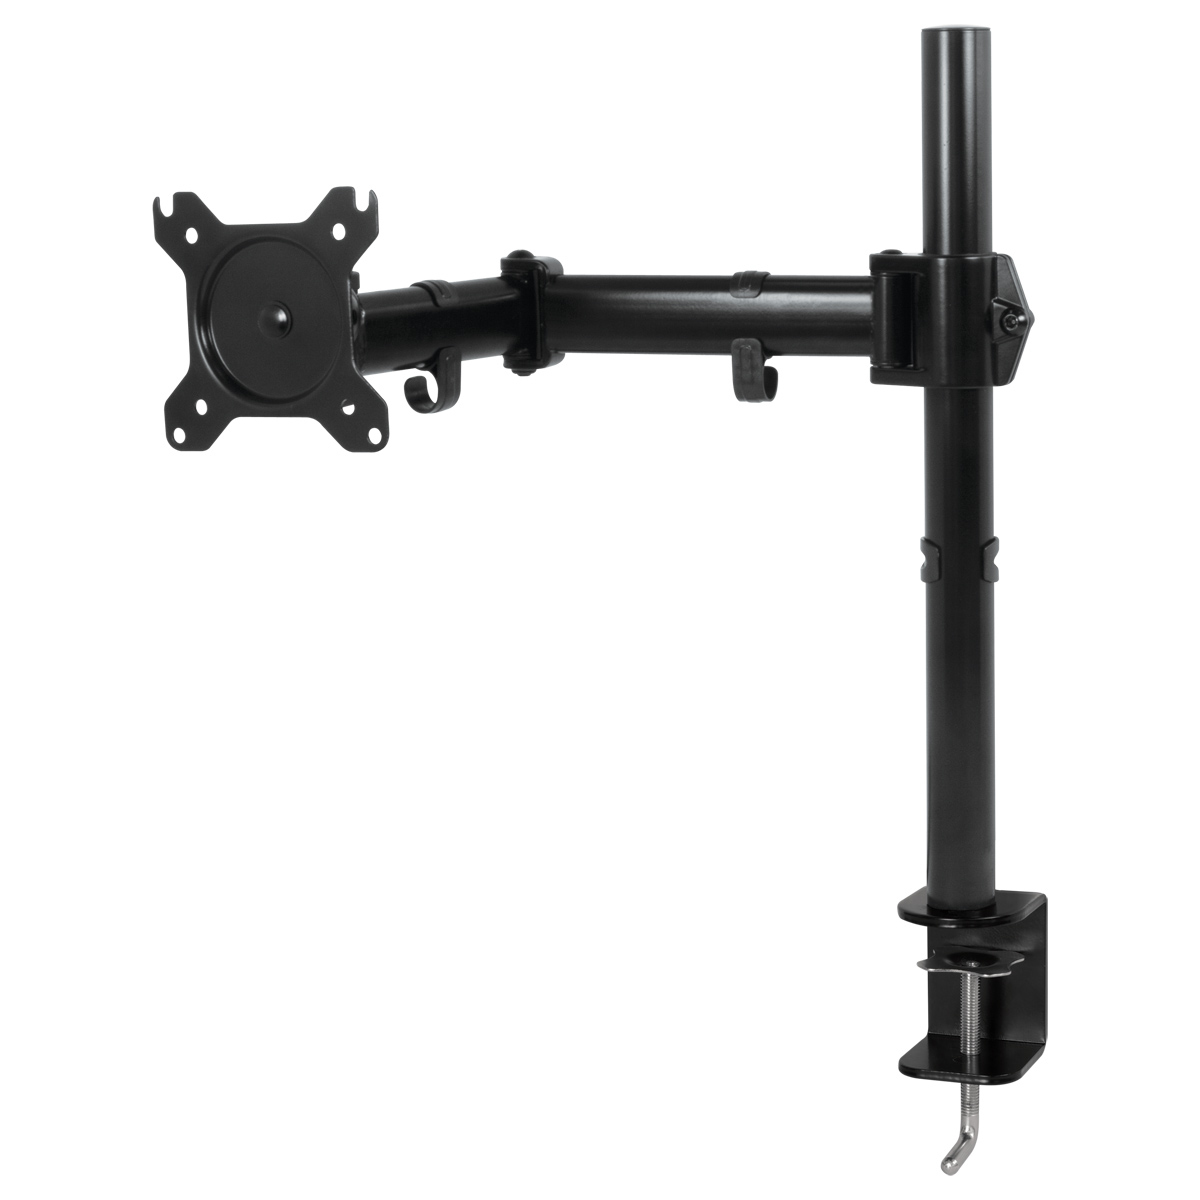 ARCTIC Z1 Basic - Desk Mount Monitor Arm